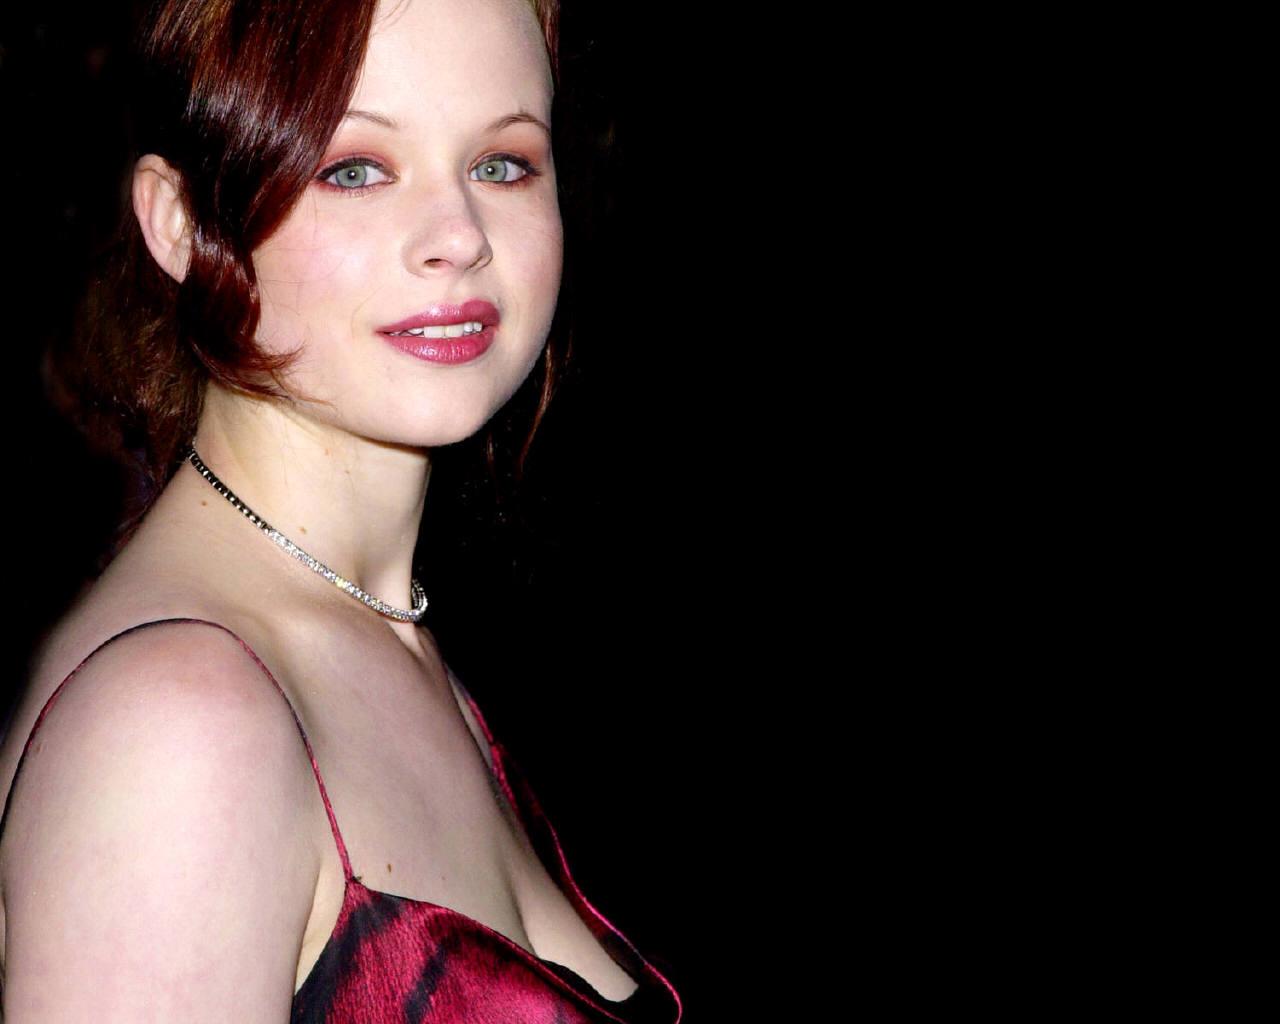 Thora Birch 364654 wallpaper - Thora Birch - Celebrities | Girls bet at home paysafecard nieaktywna ...